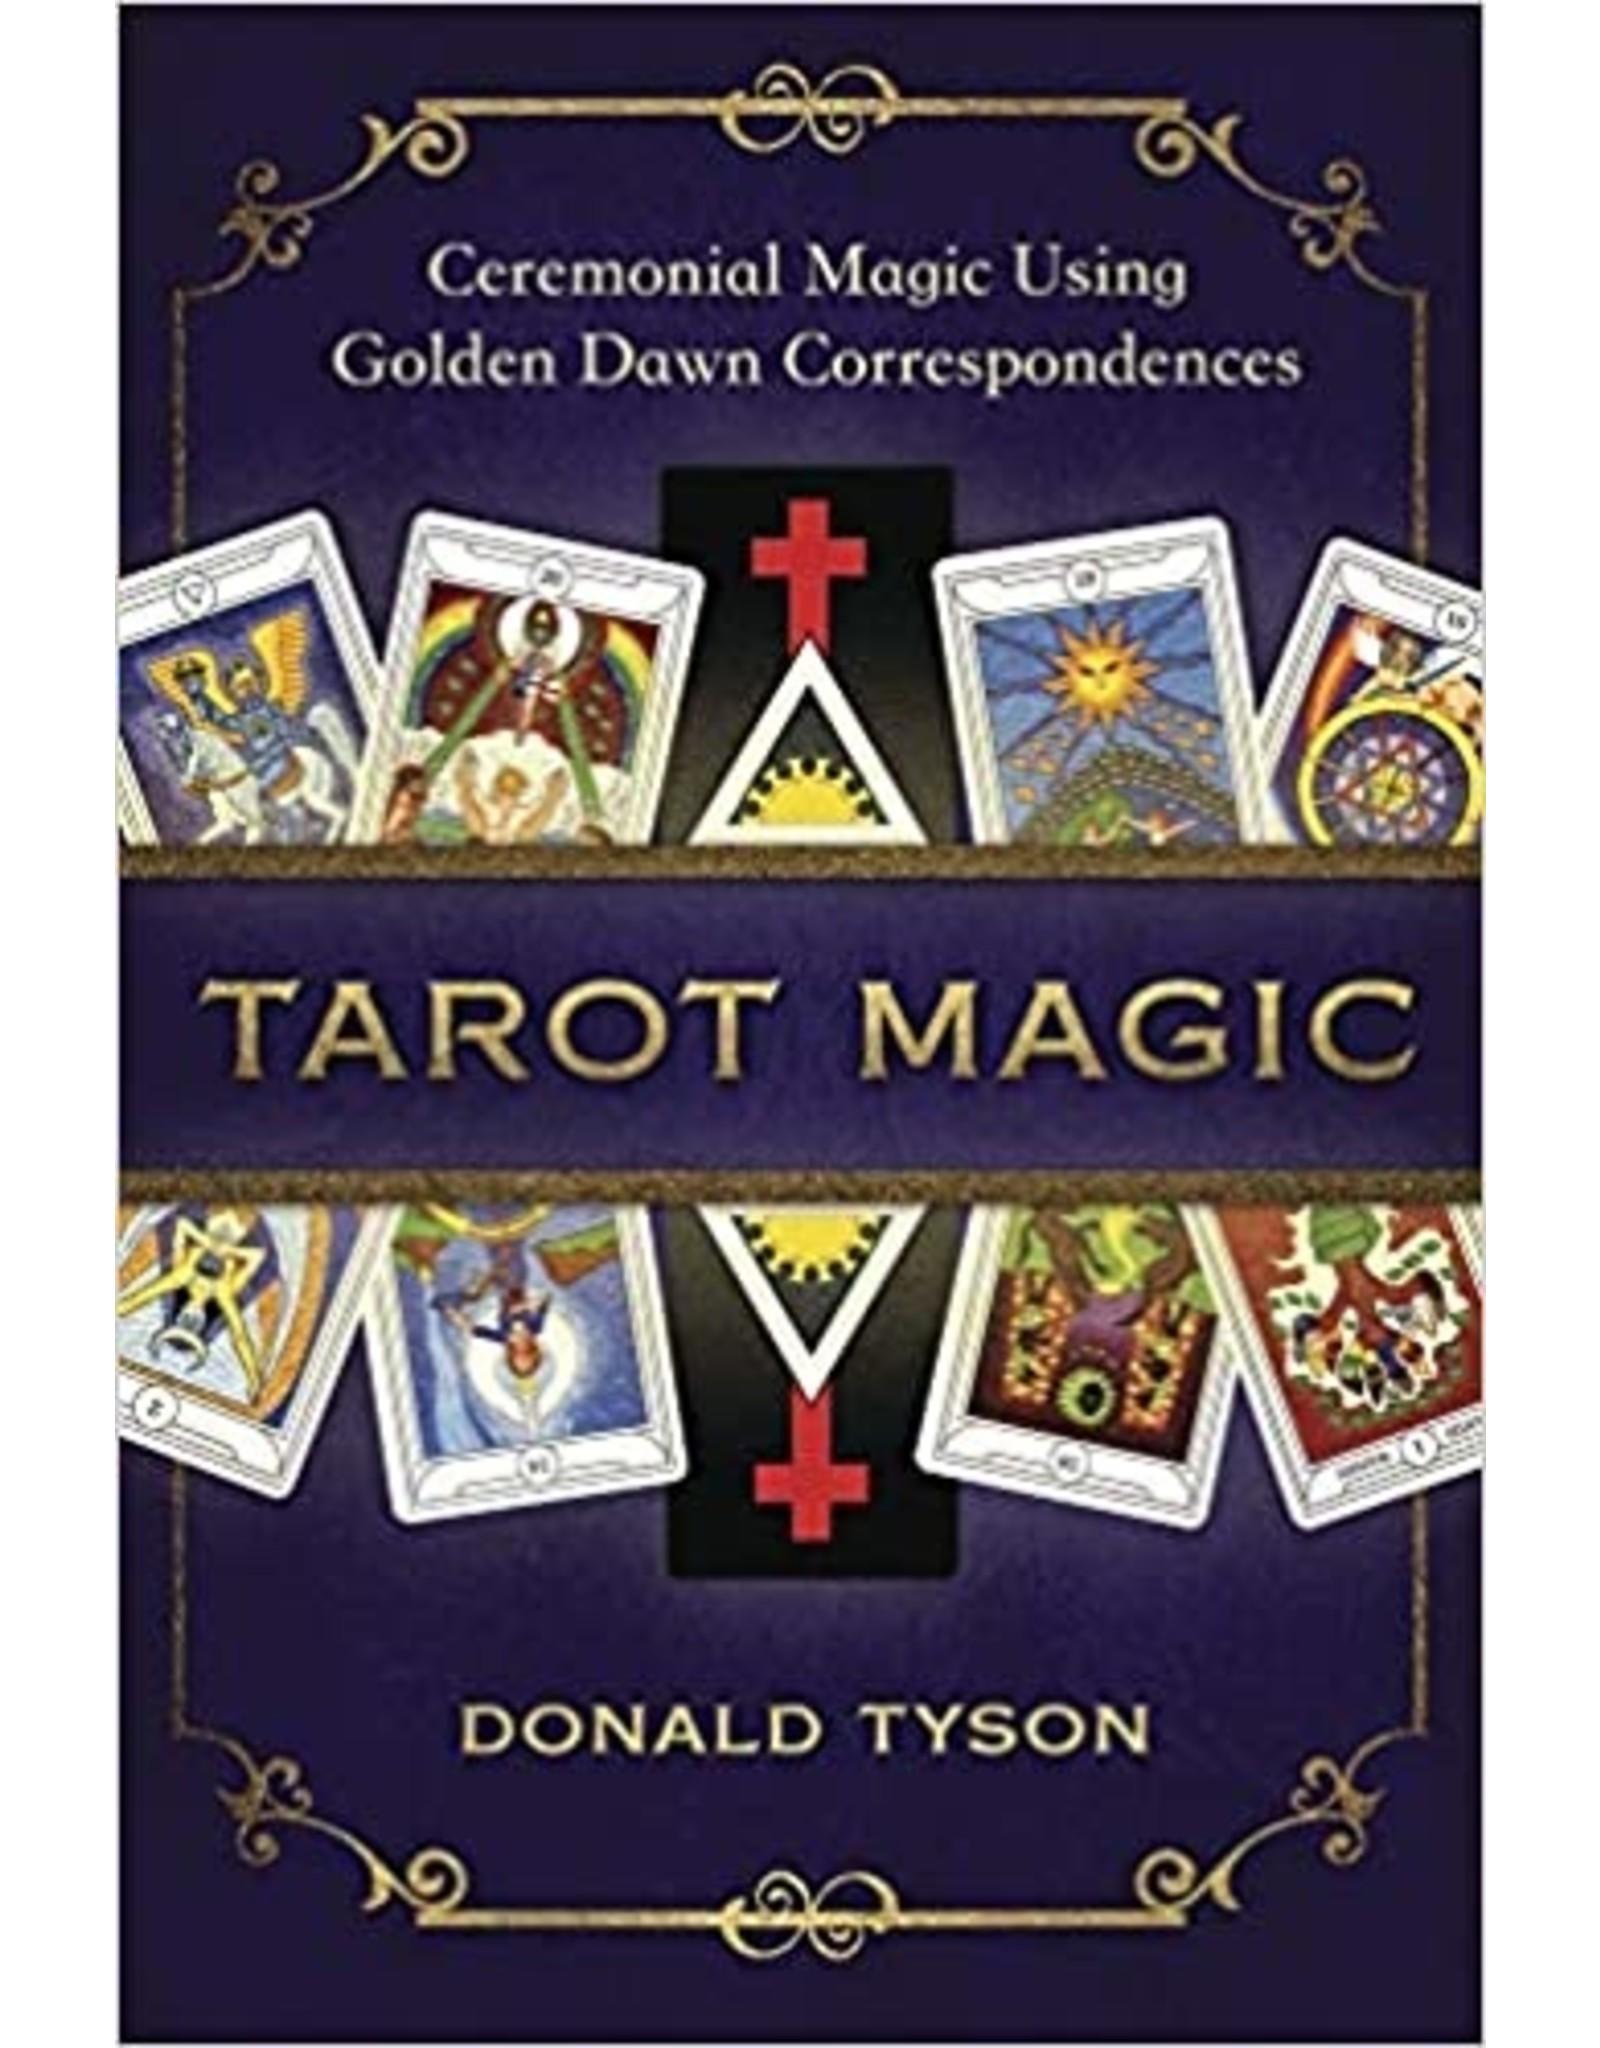 Tarot Magic: Ceremonial Magic Using Golden Dawn Correspondences